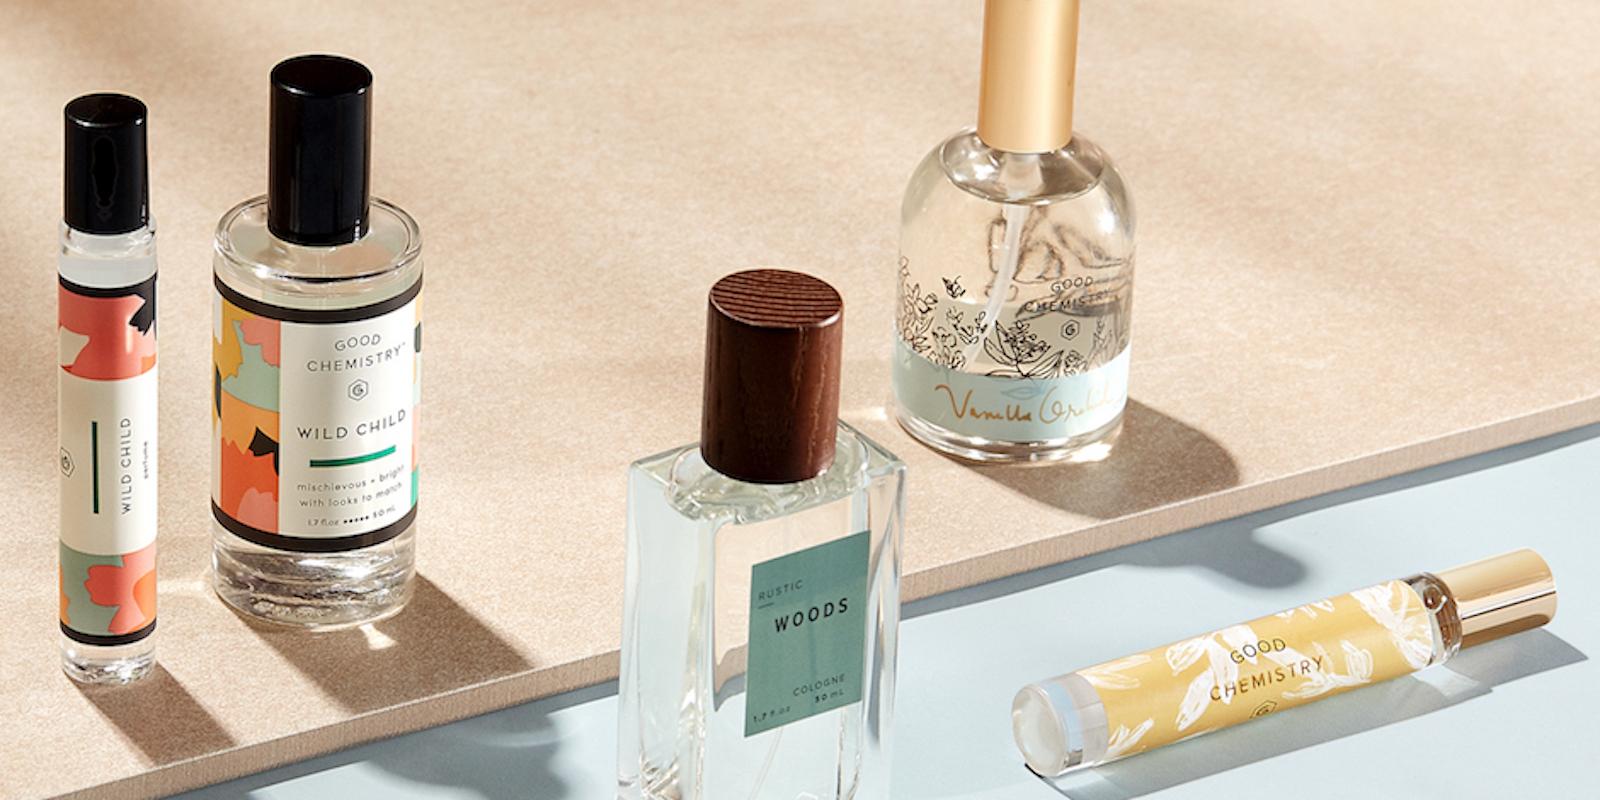 targets_good_chemistry_fragrance_line_main_image